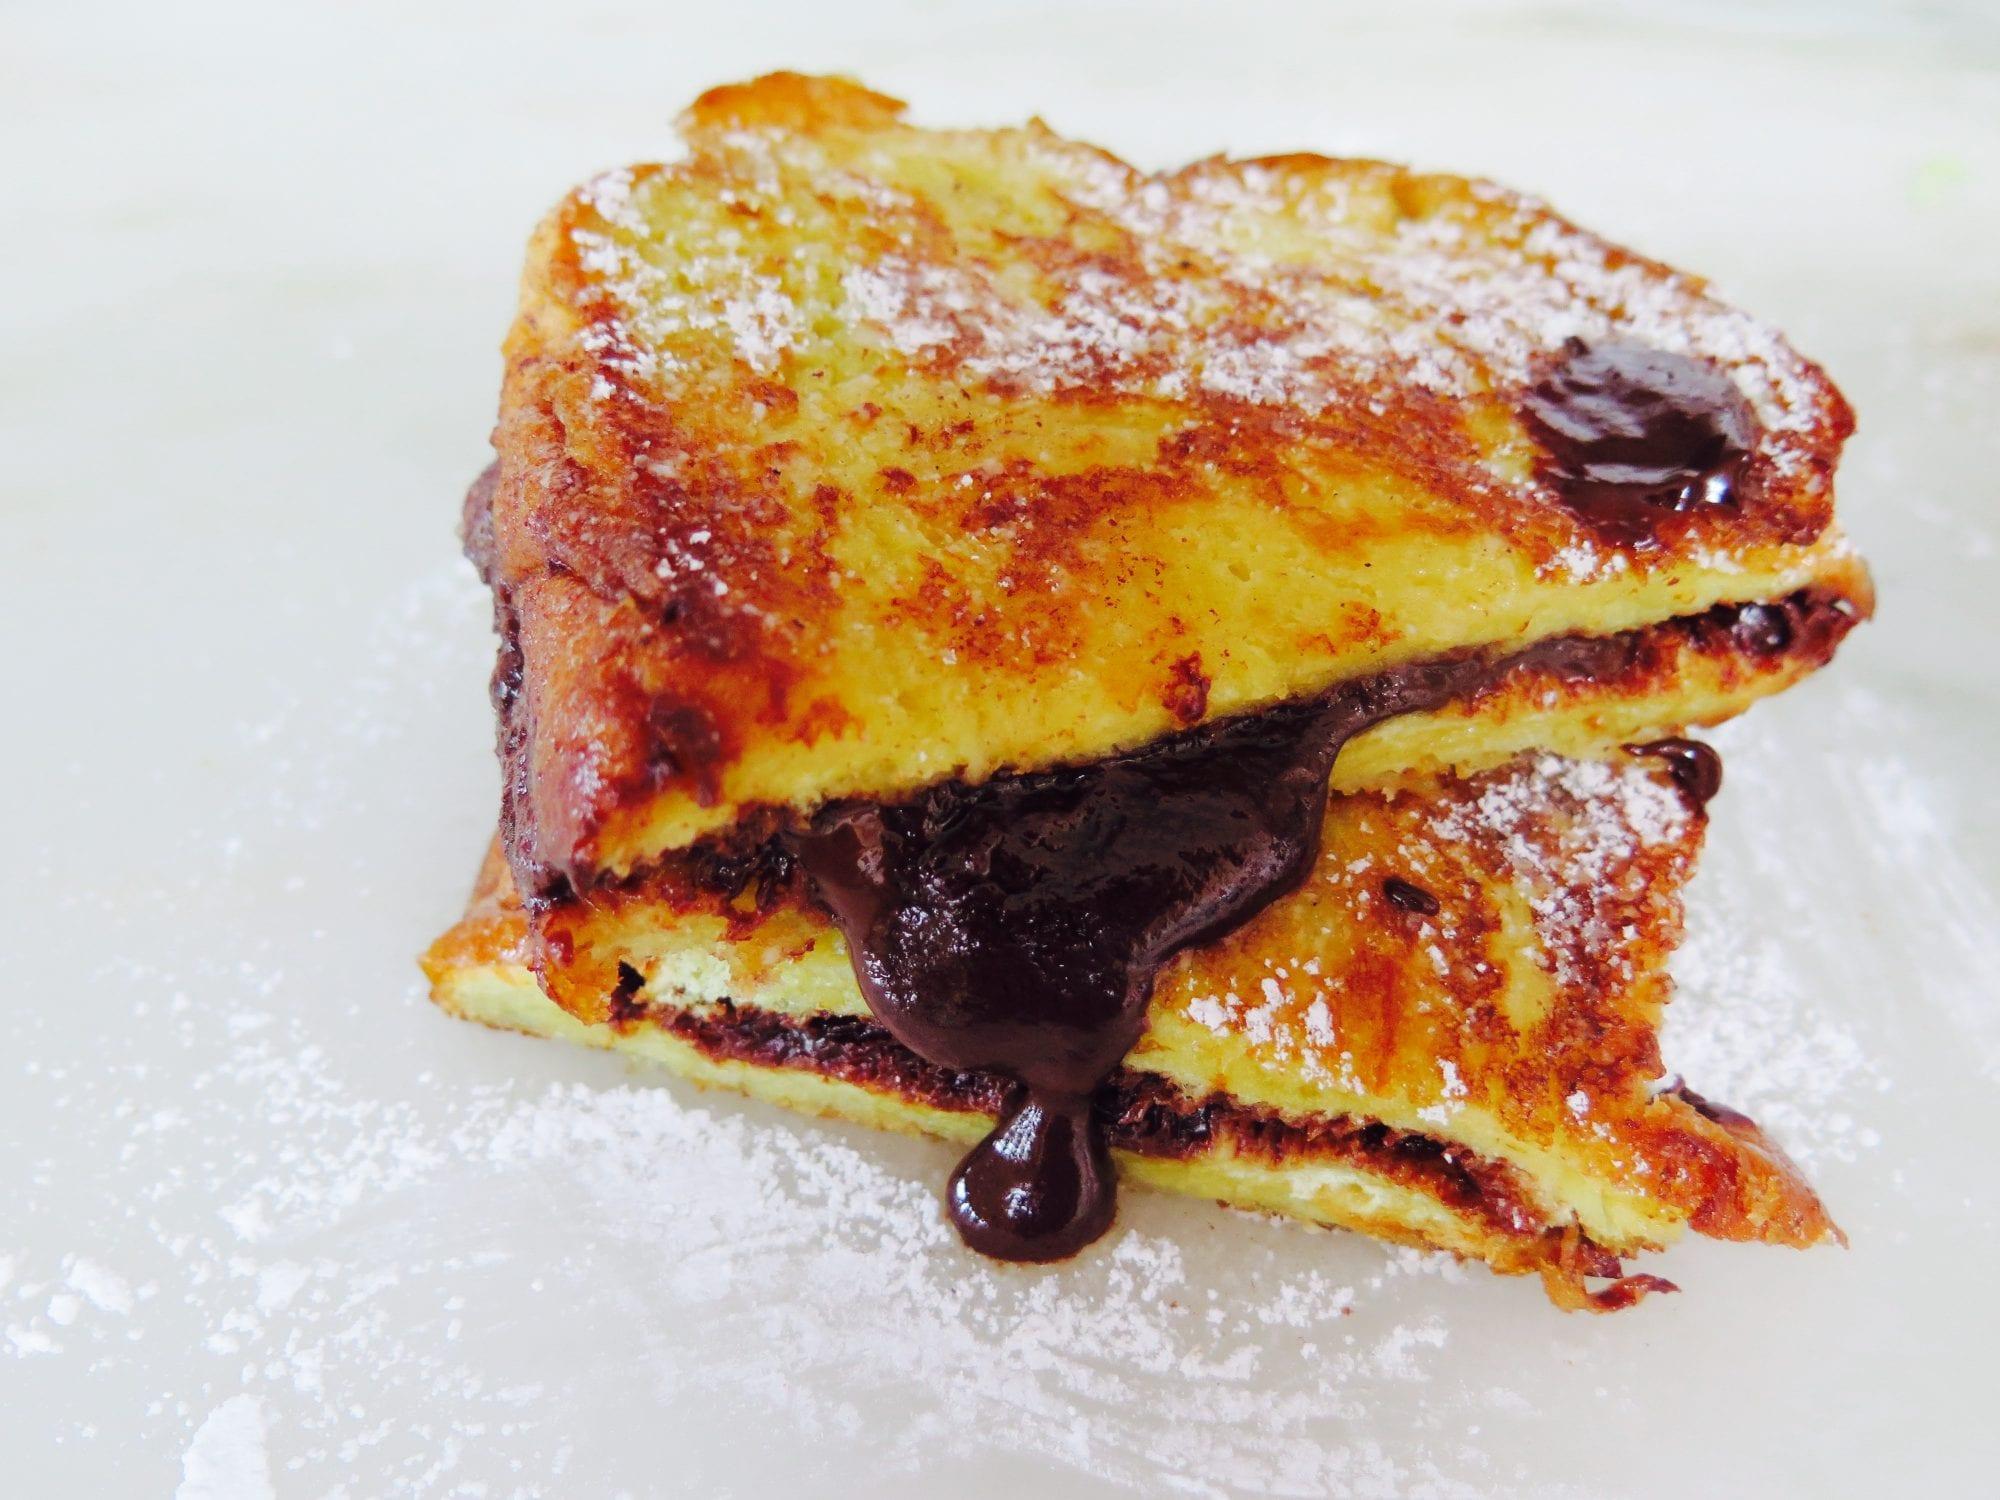 french toast sandwiches with dark chocolate ganache and sea salt